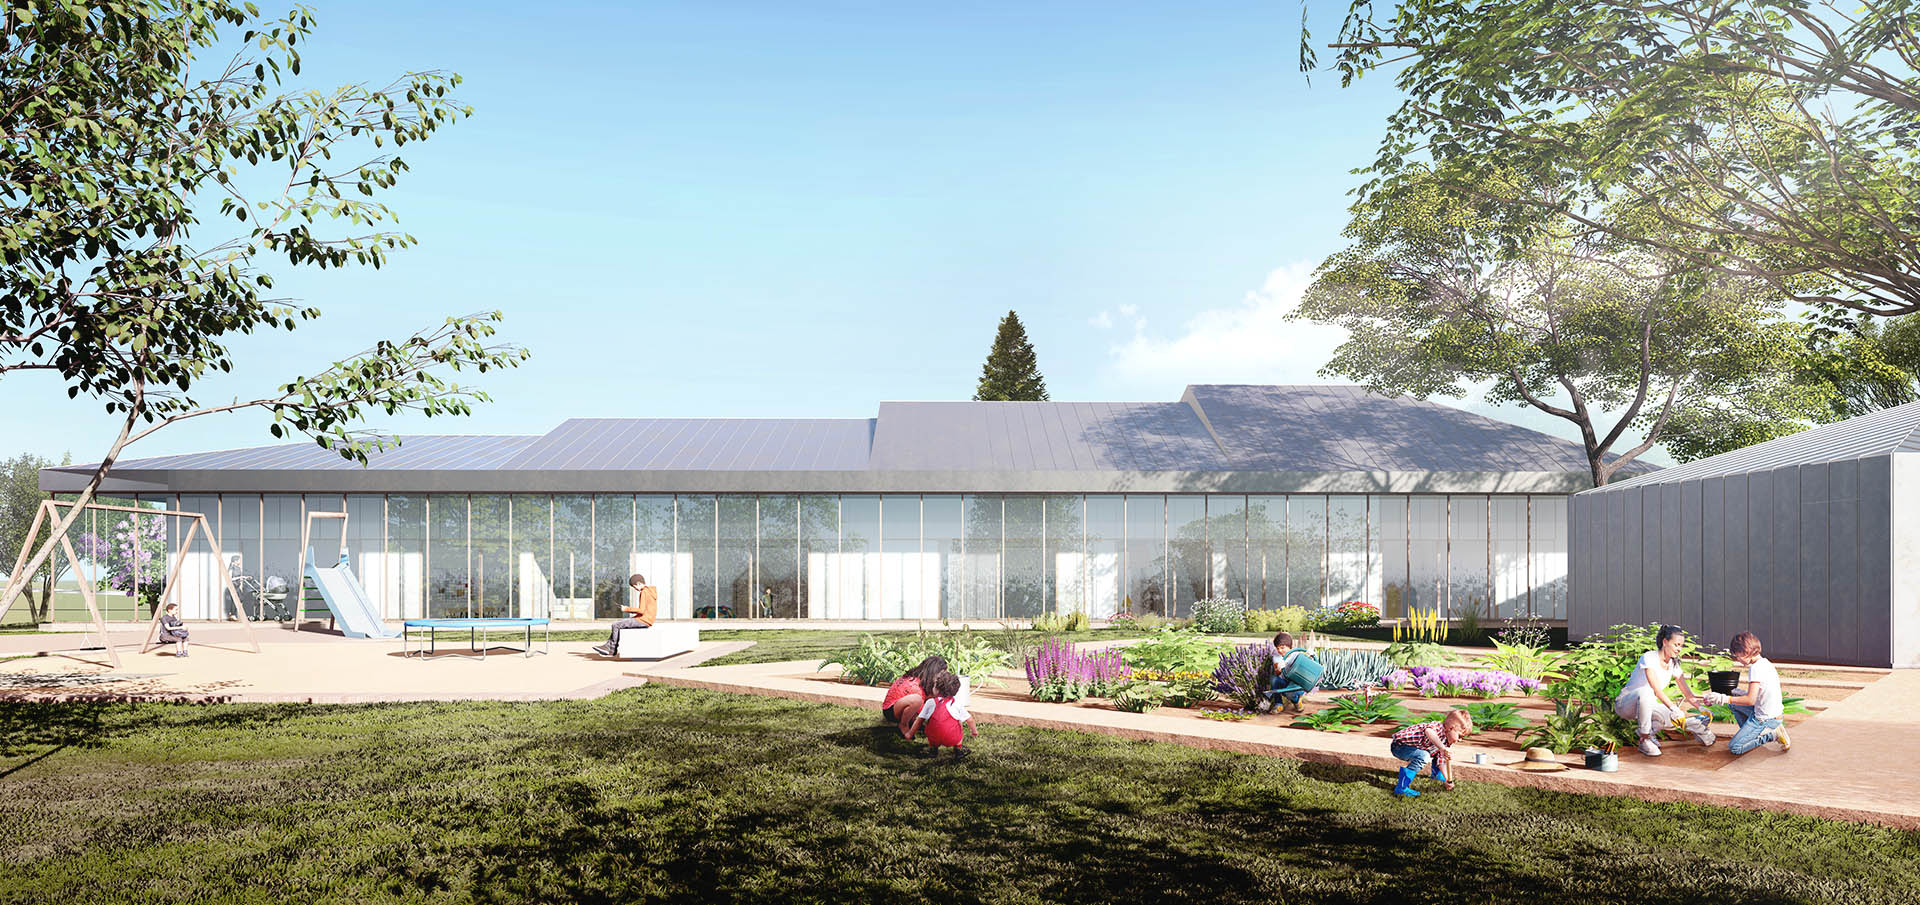 sastudio architecture kindergarden prague